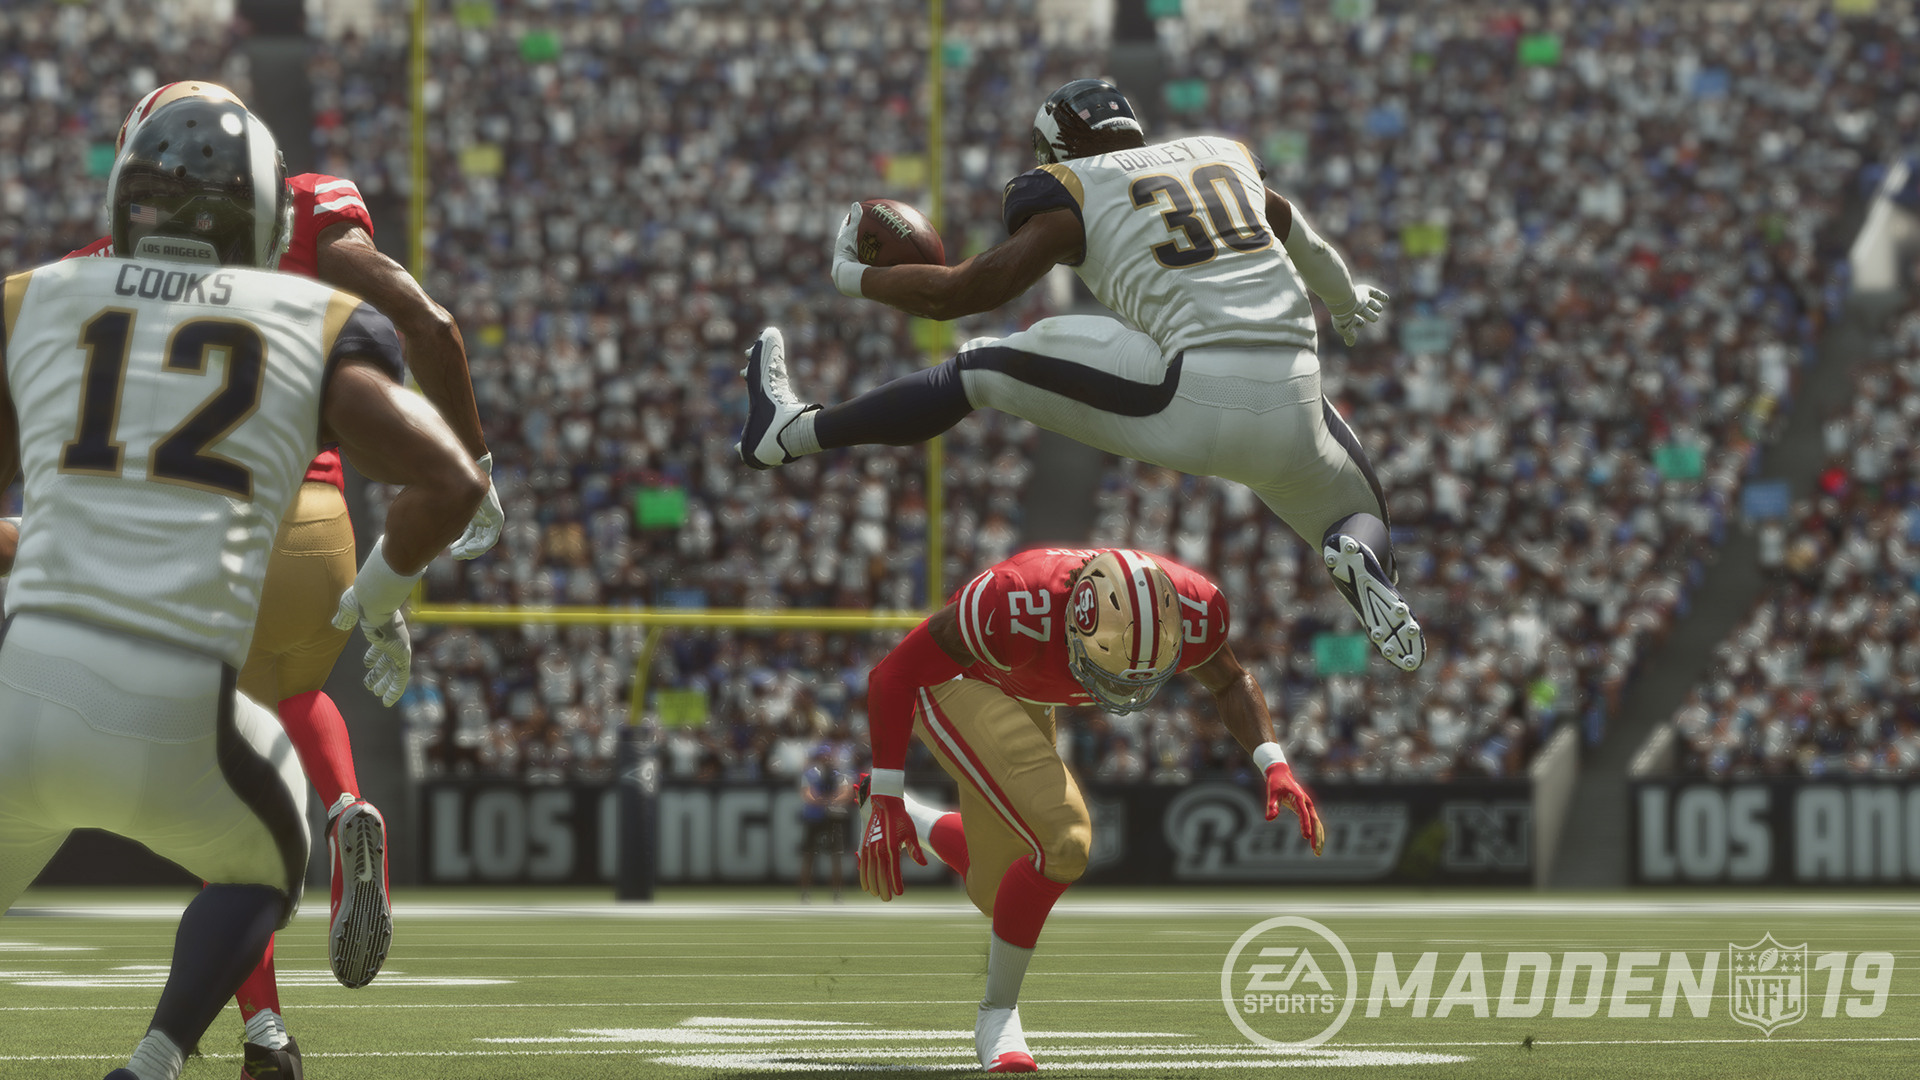 Today's Best Game Deals: Madden NFL & FIFA 19 $30 ea, Battlefield V Deluxe $72, more